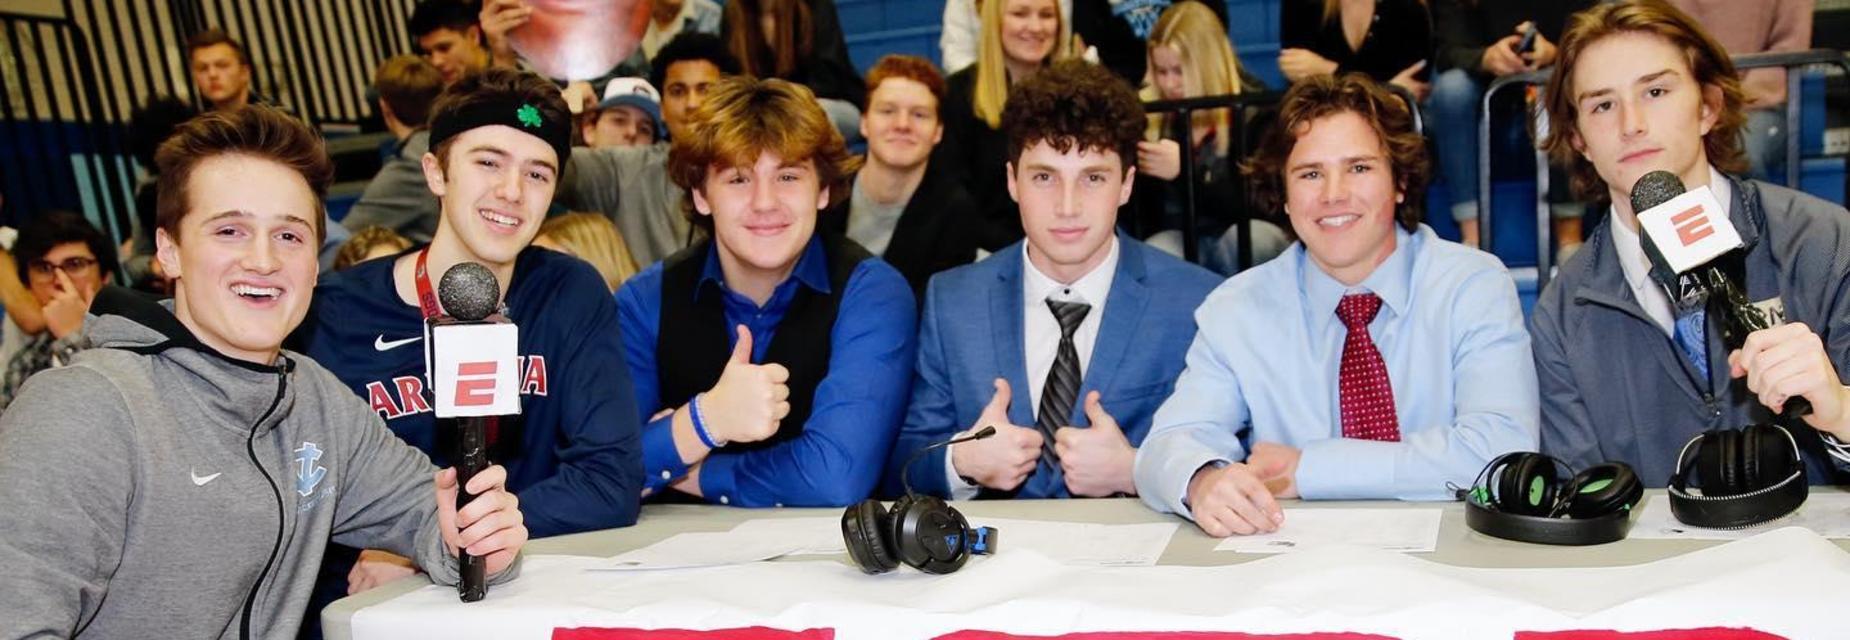 CV Student Sport Announcers